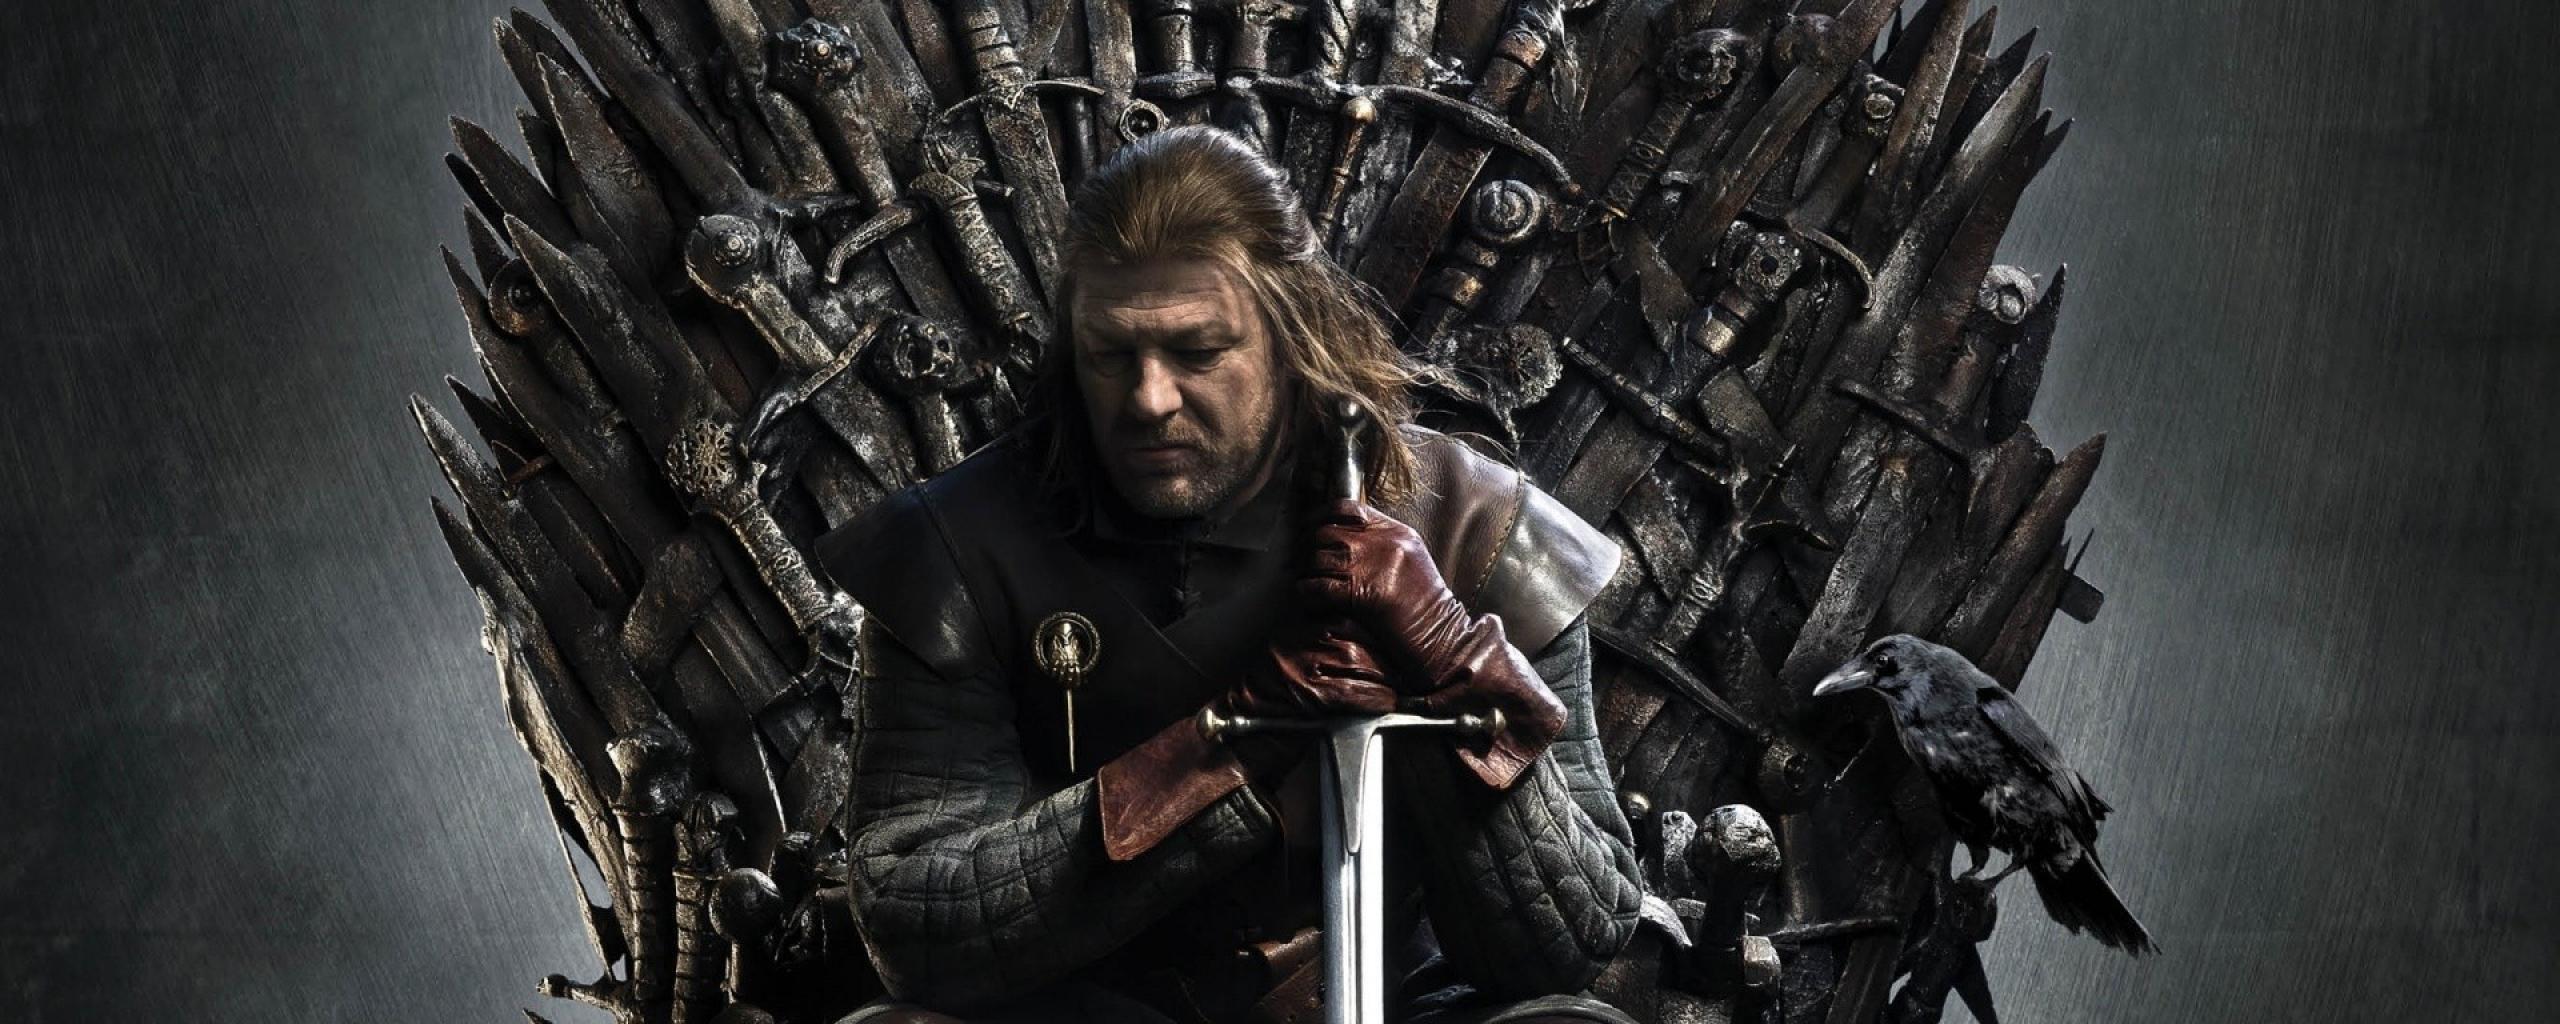 Game Of Thrones Ned Stark 1080p Photoshoot, Full HD Wallpaper